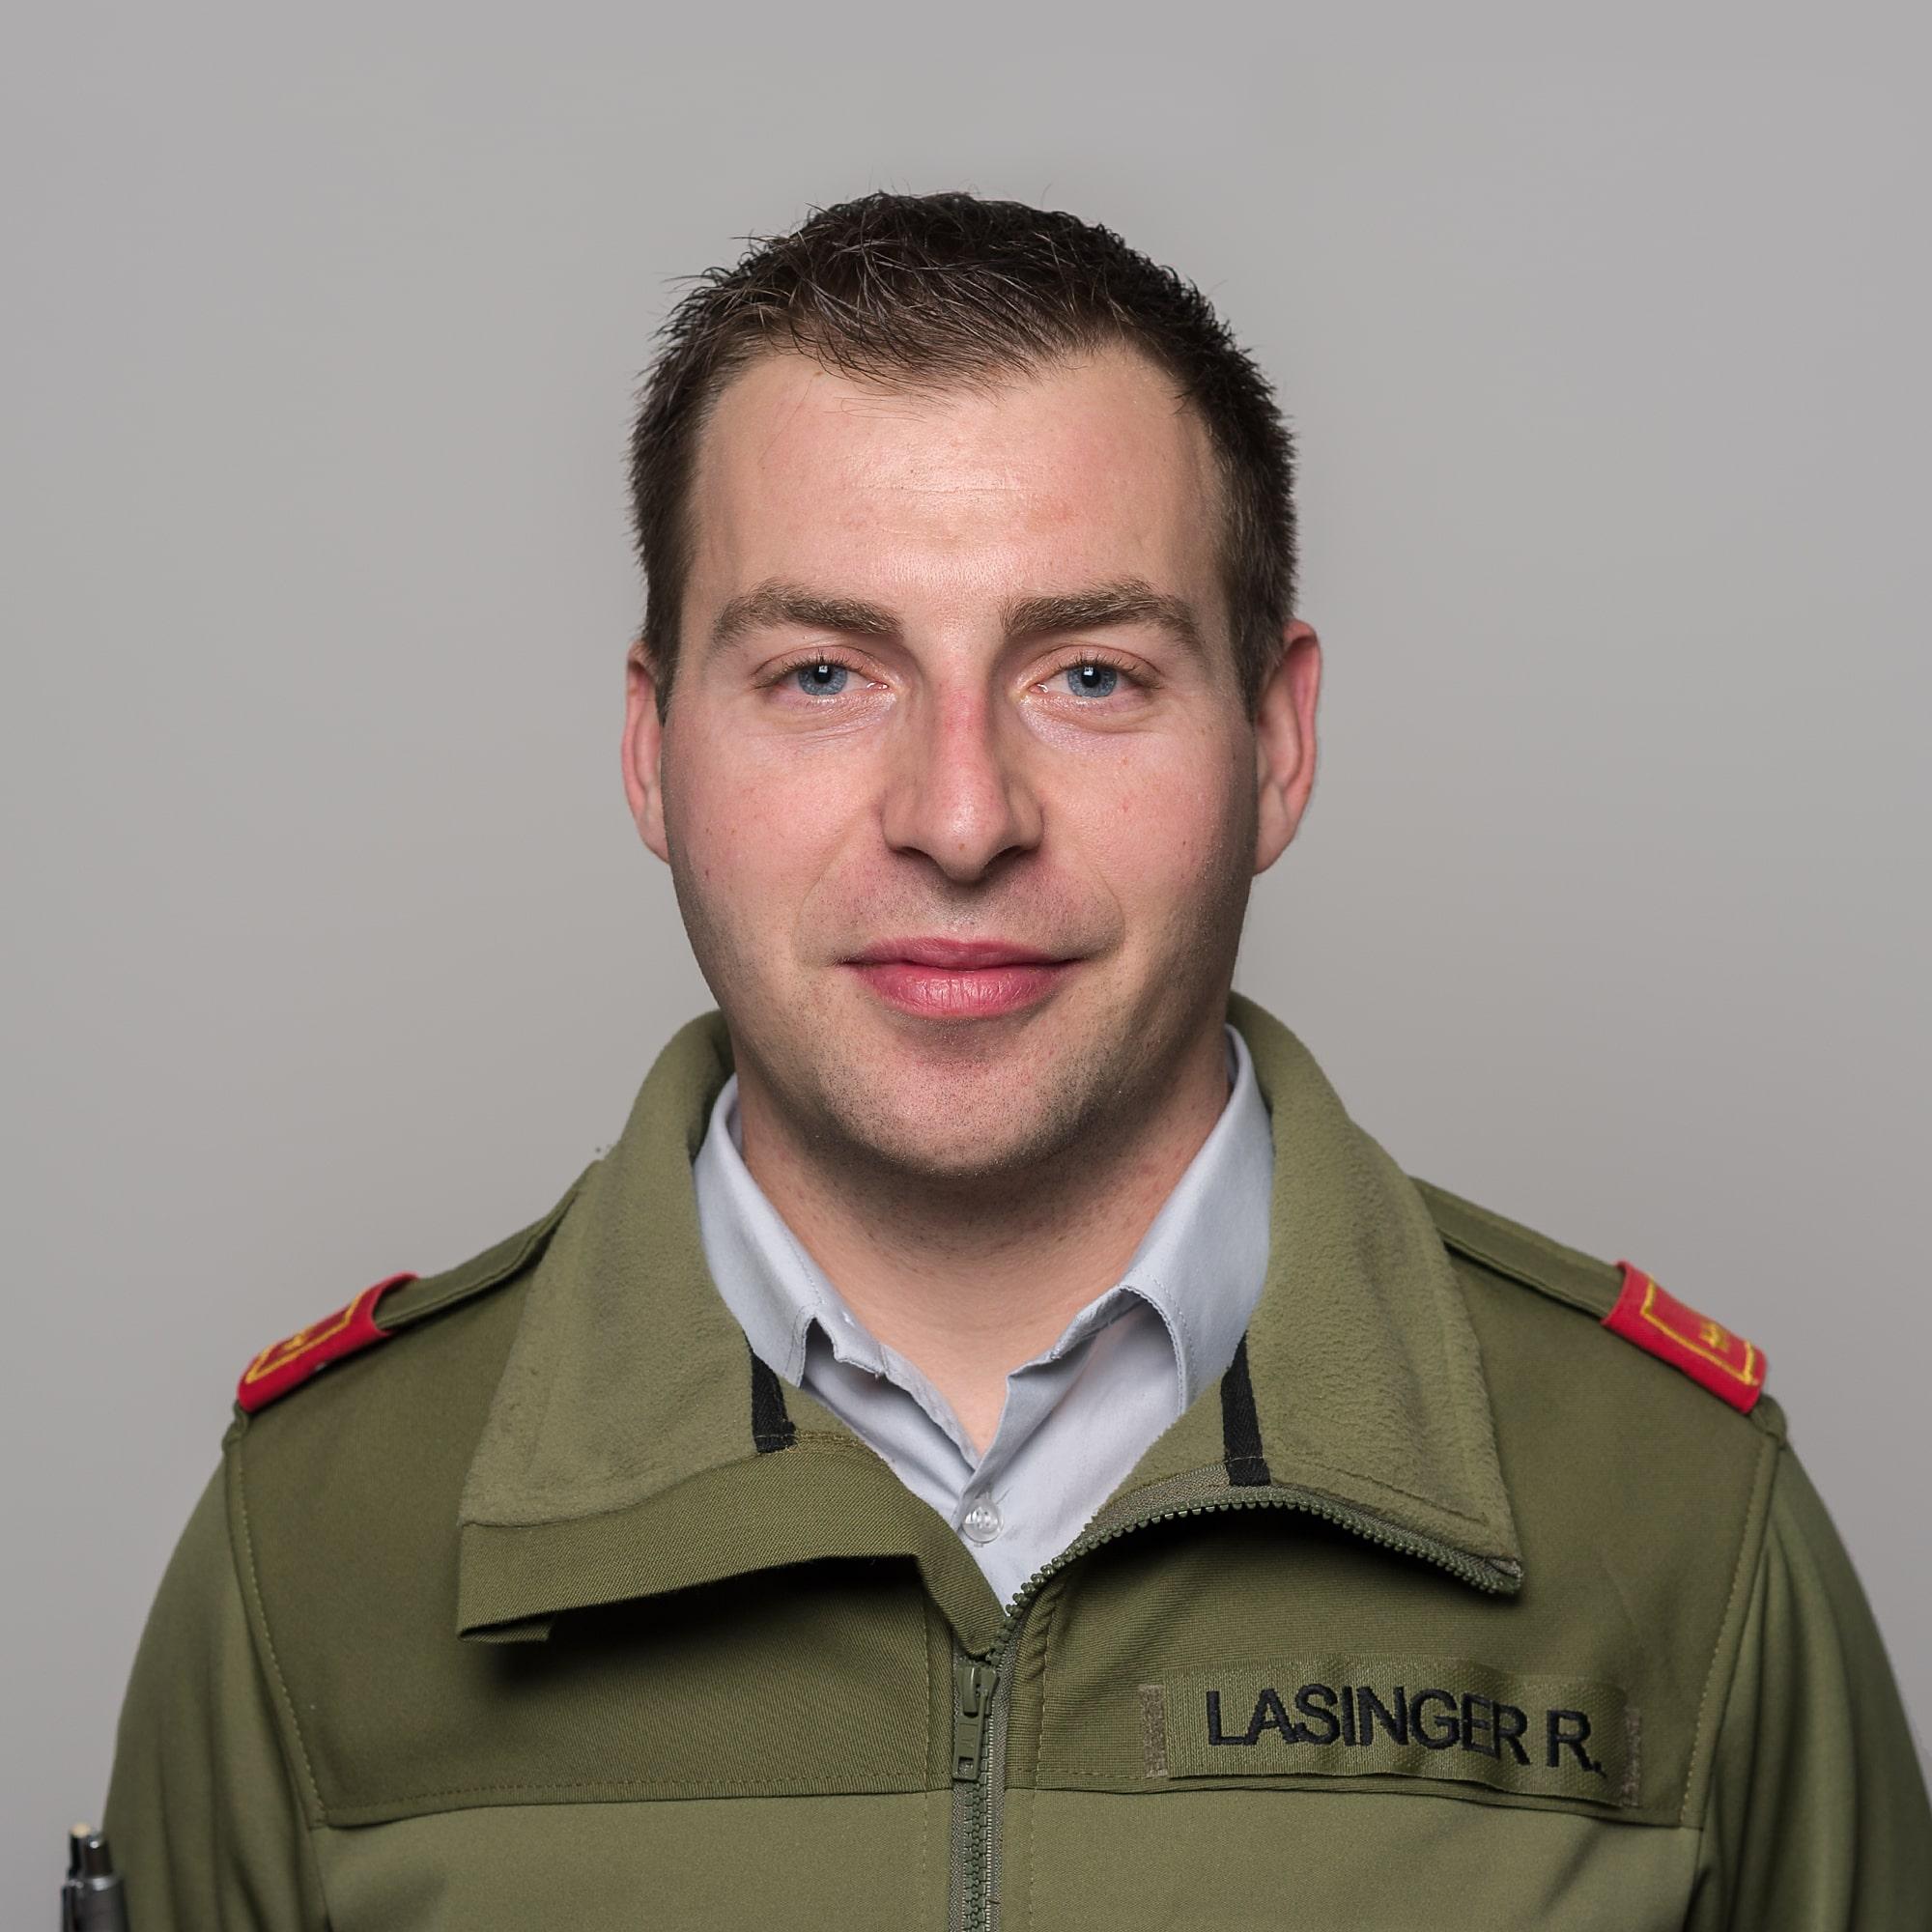 OBI Roman Lasinger